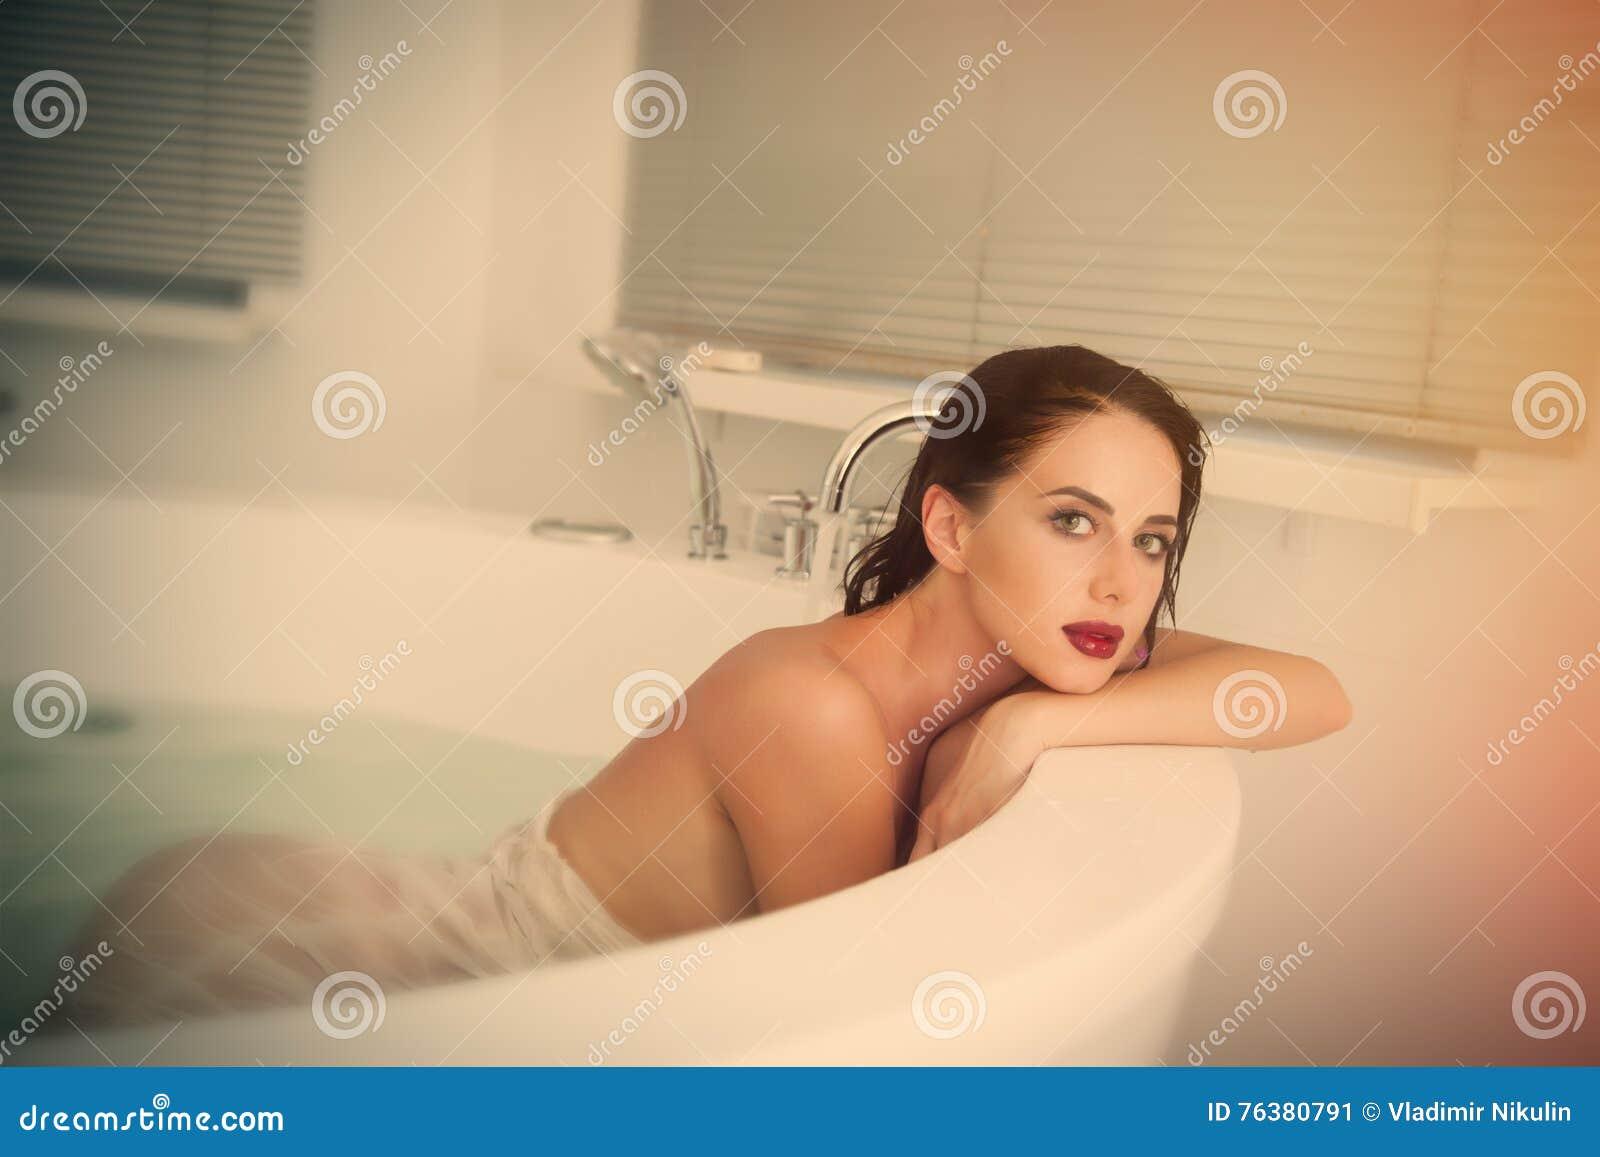 Фото молодая в ванне фото 277-464